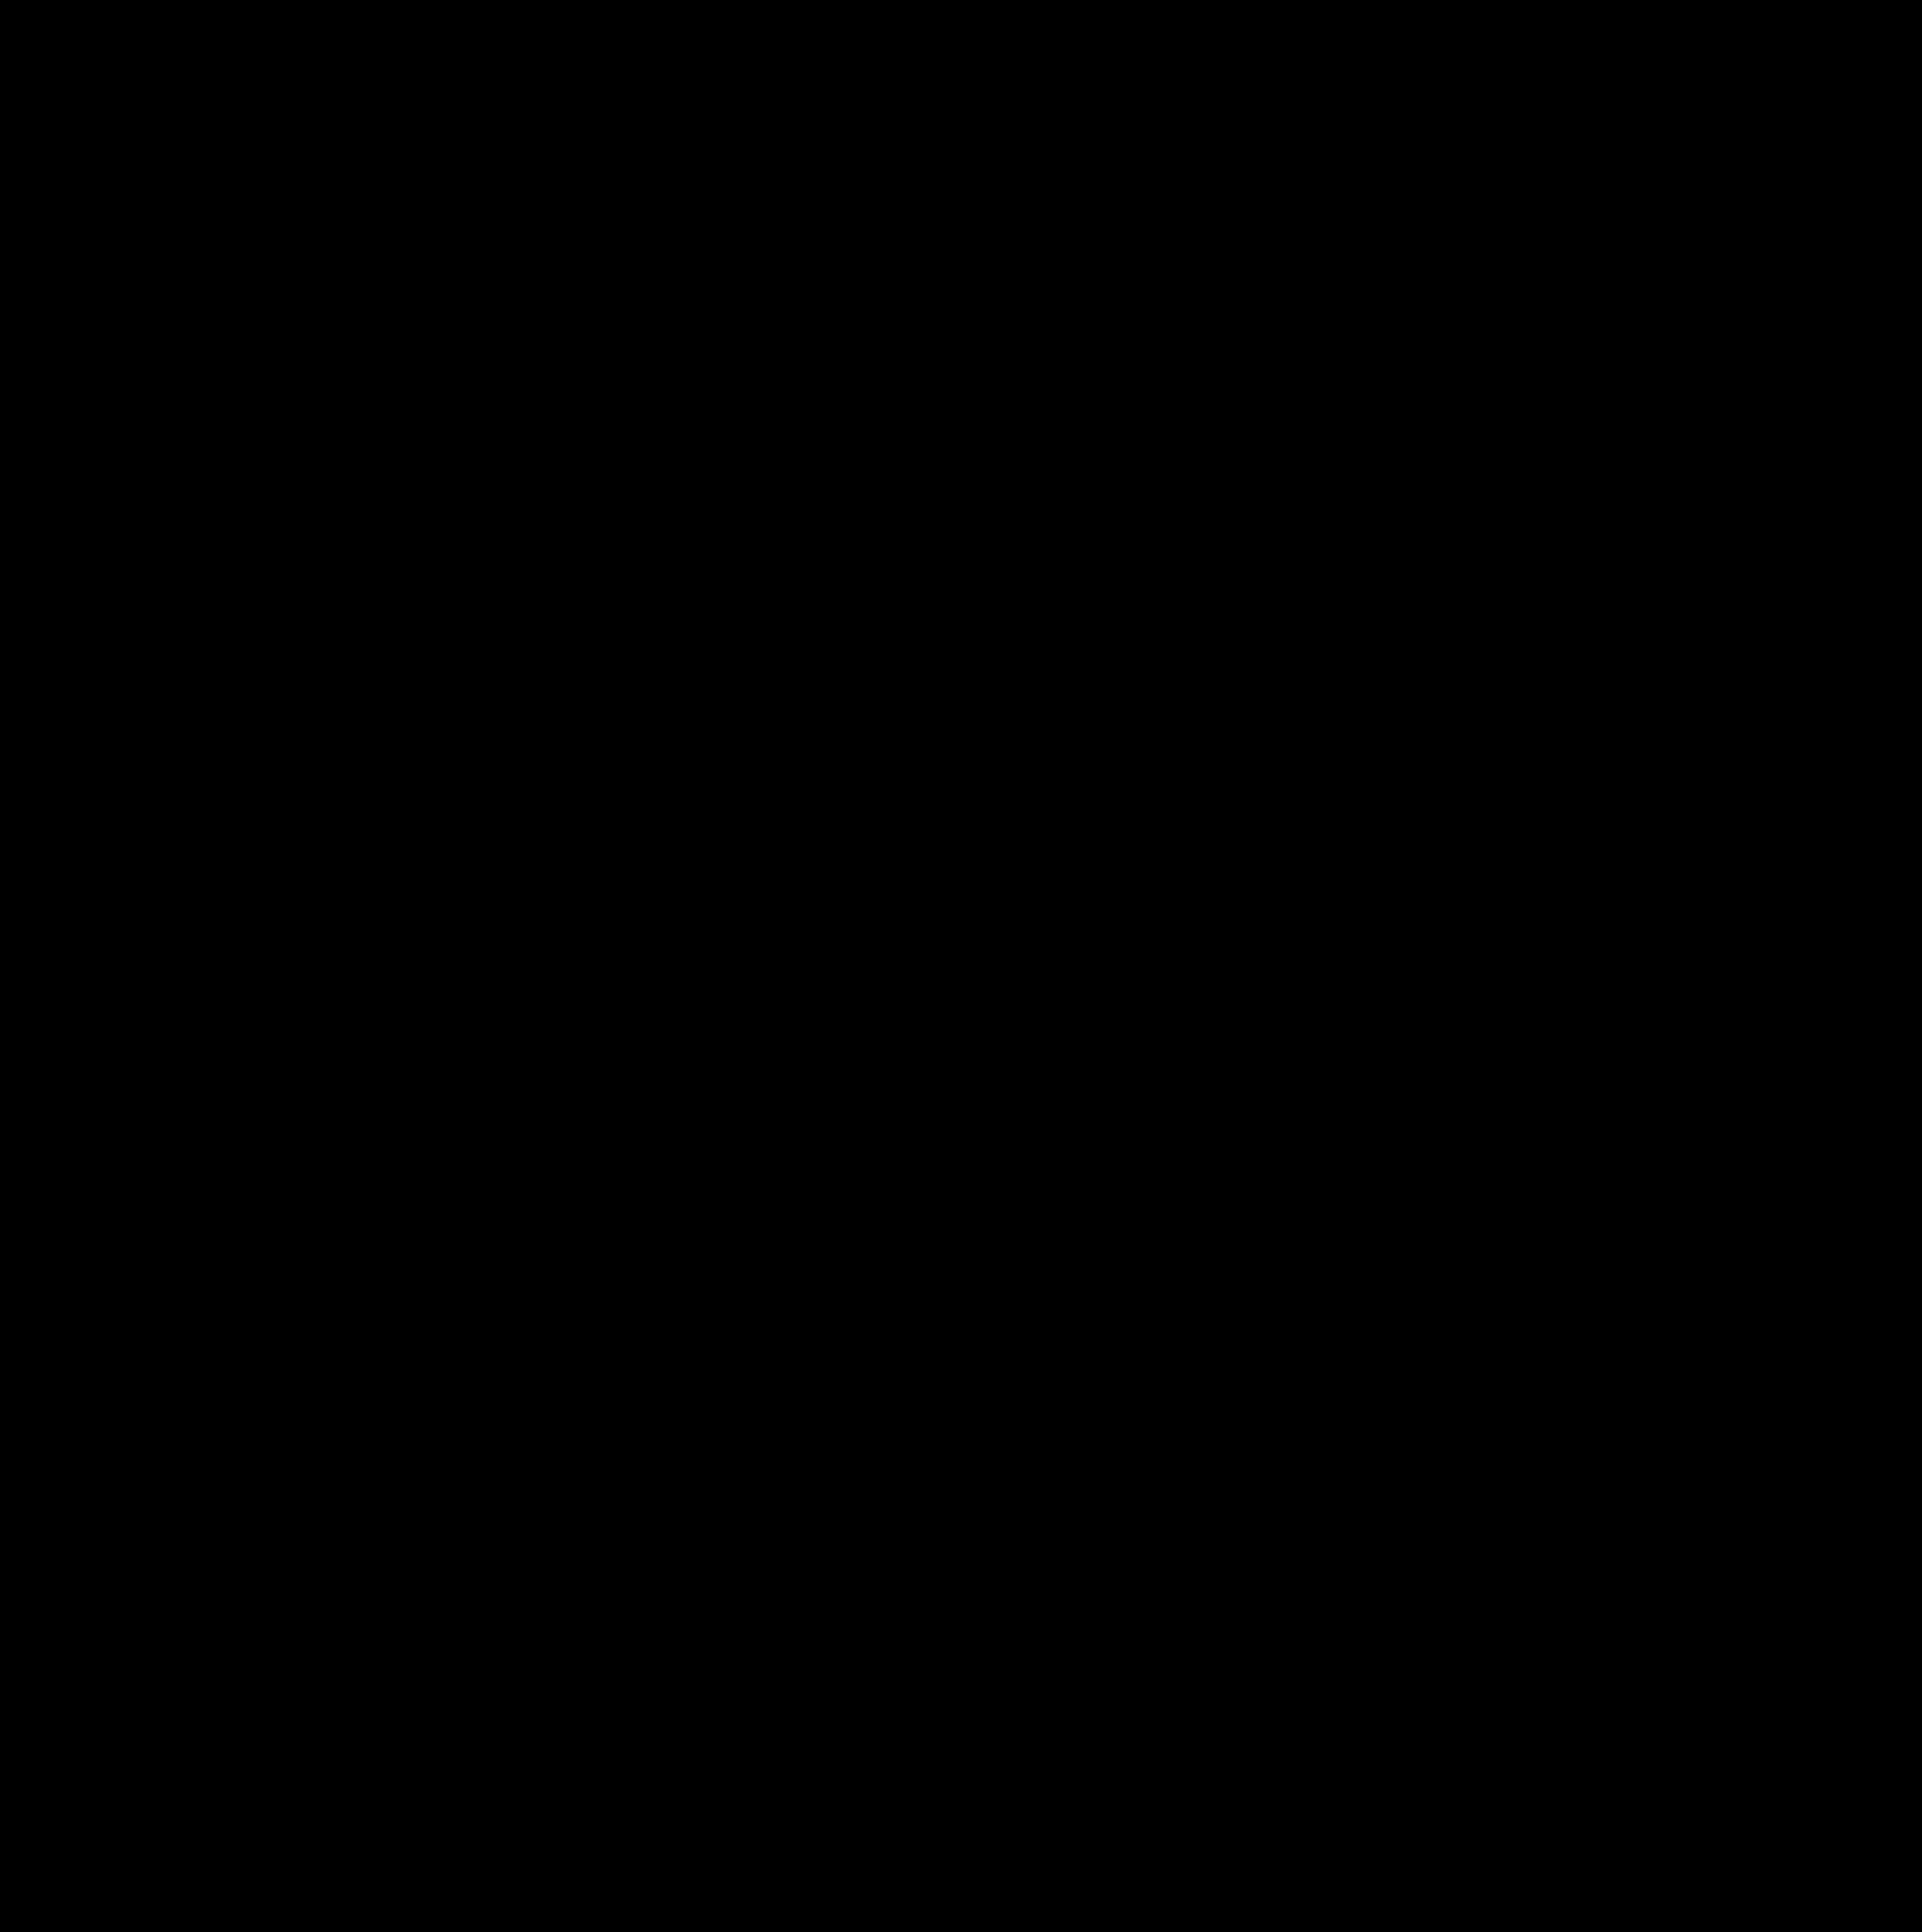 clip art free Spiral Black Transparent Clip Art